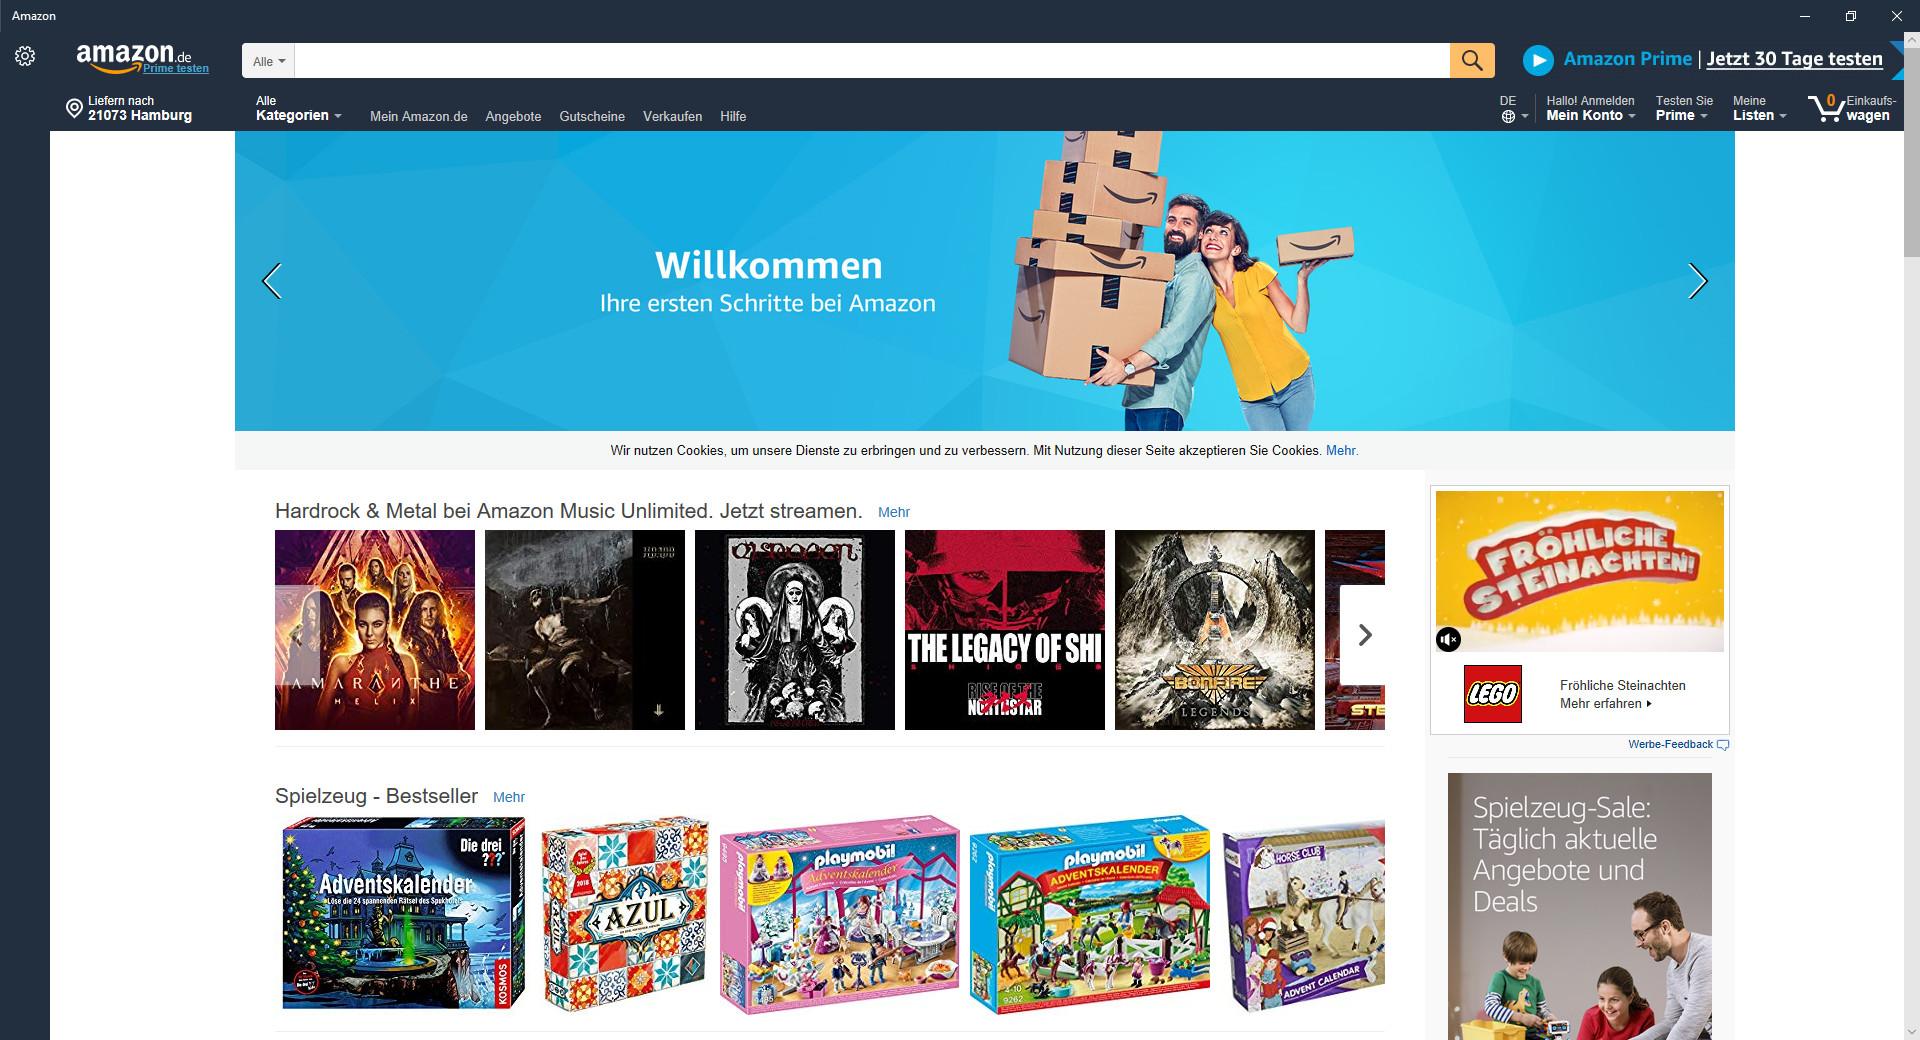 Screenshot 1 - Amazon (Windows-10-App)